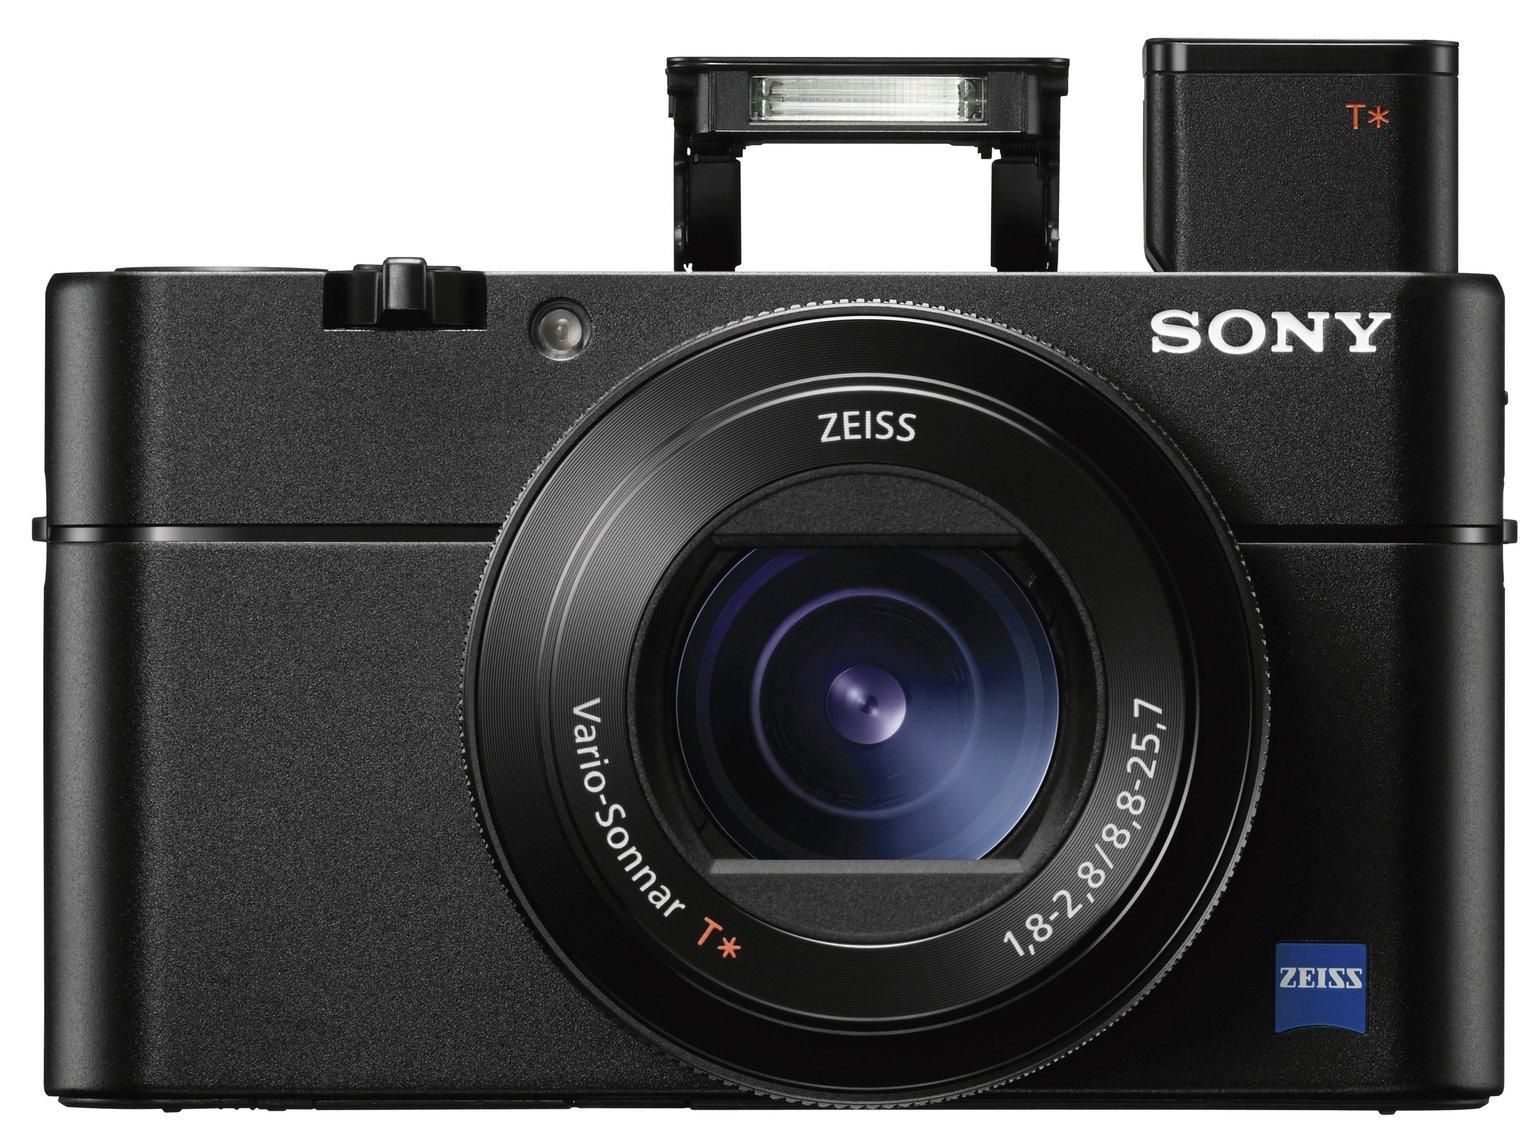 Sony RX100 M5-A Premium Compact Camera